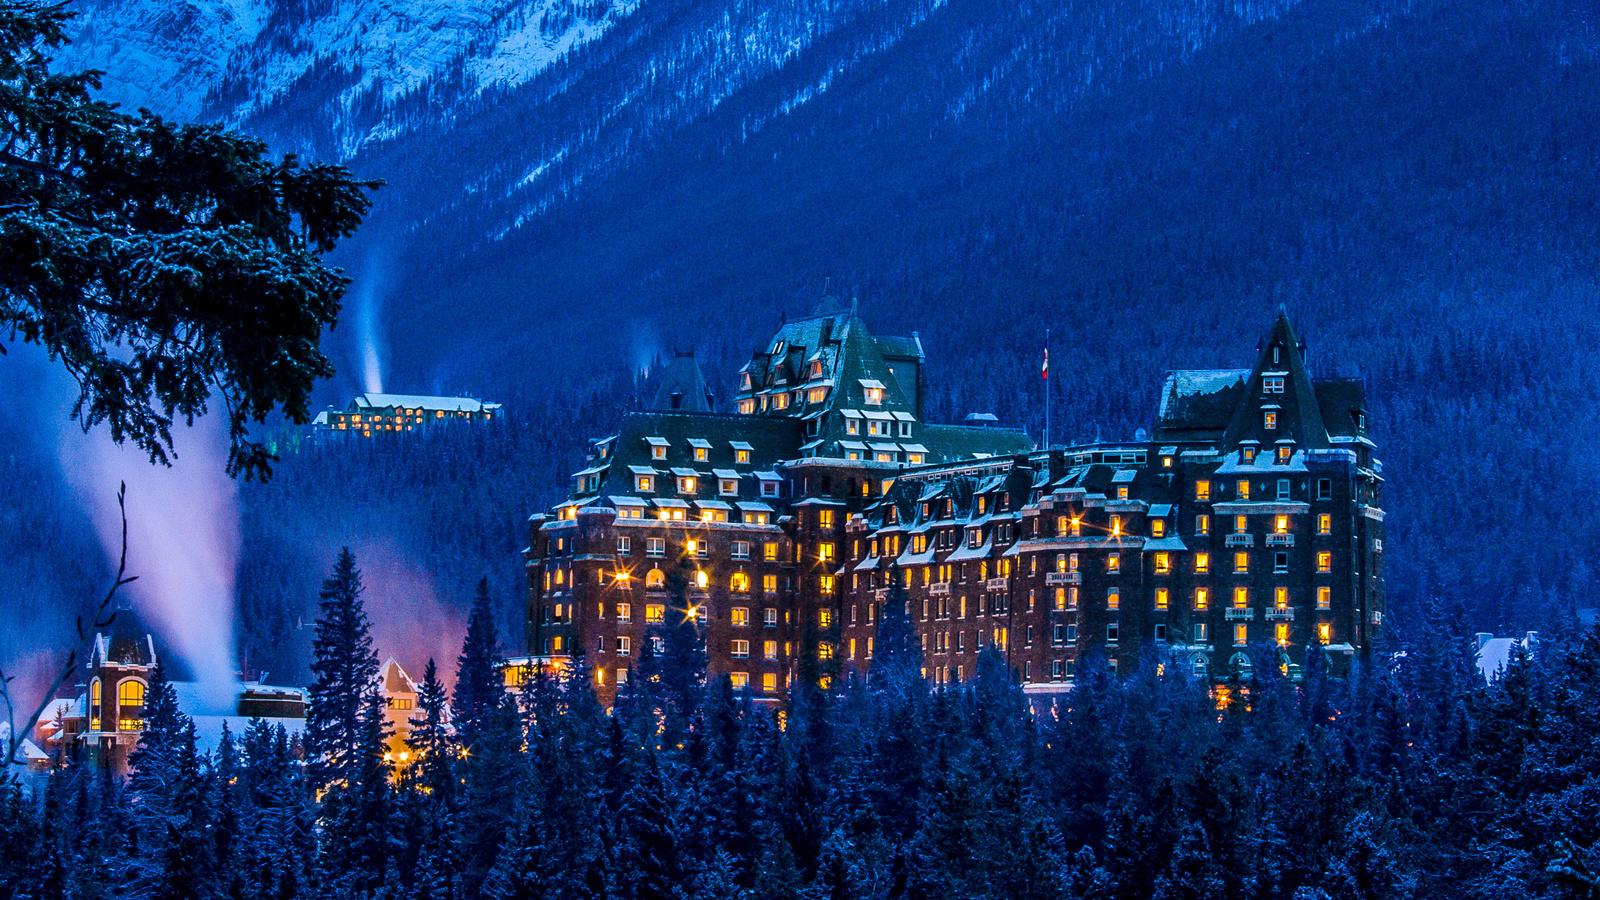 banff springs hotel, зимой, национальный парк банф, альберта, канада